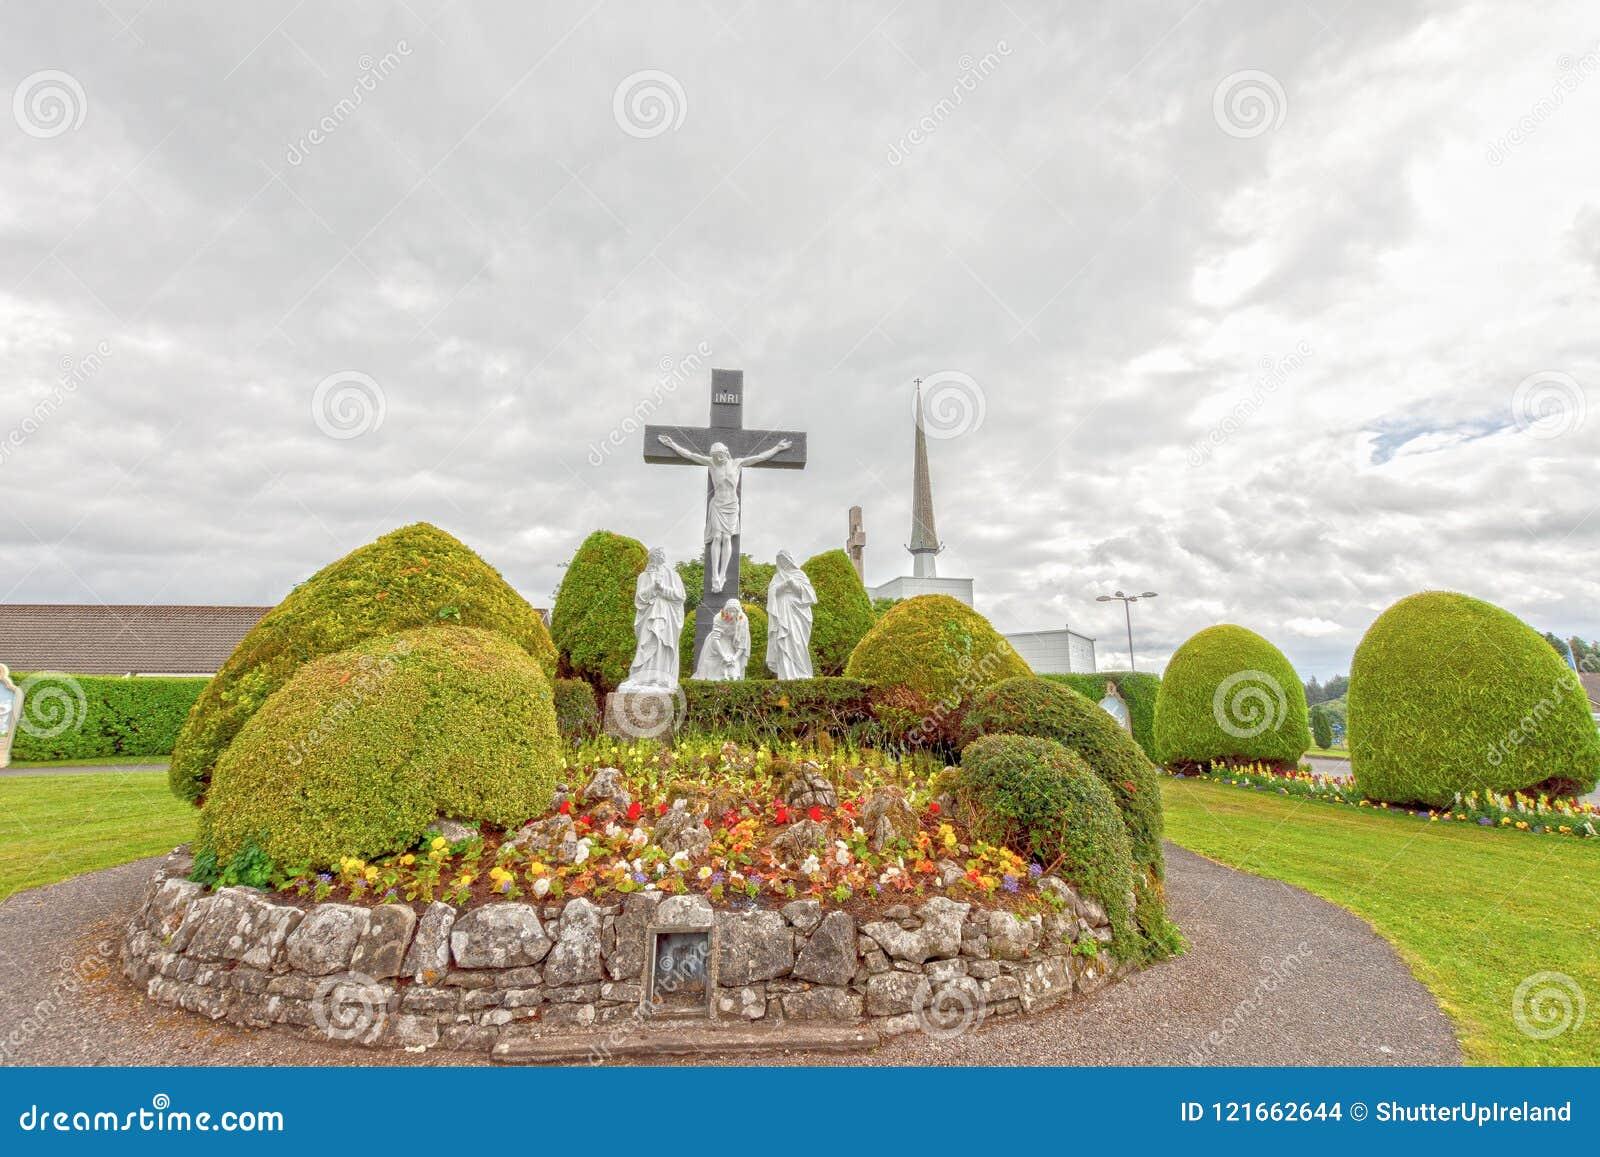 Knock, Mayo, Ireland. Ireland`s National Marian Shrine in Co Mayo, visited by over 1.5 million people each year. Knock Shrine.